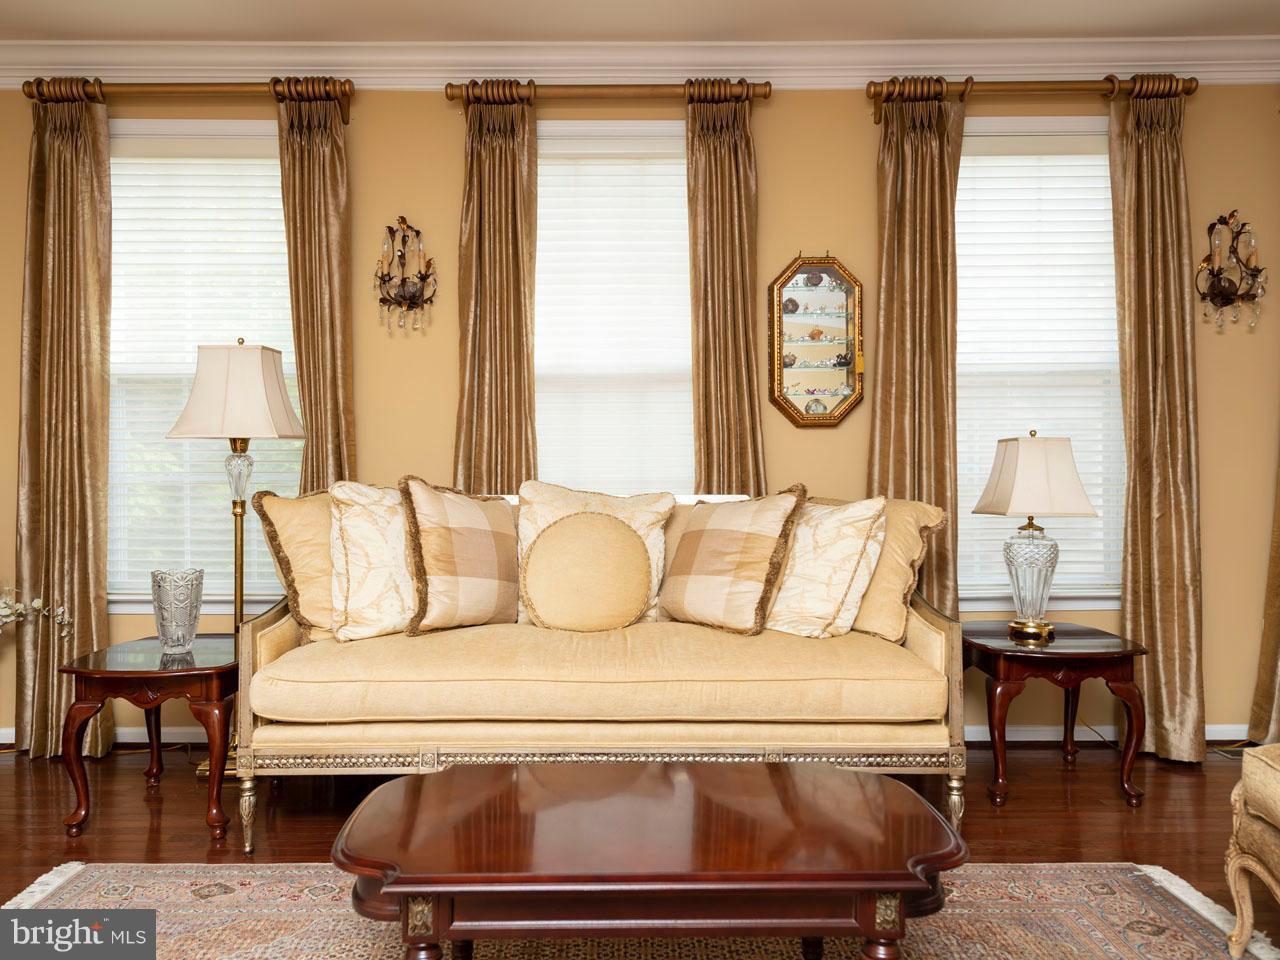 VAFX426100-301143656766-2021-09-05-14-39-04  |   | Chantilly Delaware Real Estate For Sale | MLS# Vafx426100  - Best of Northern Virginia